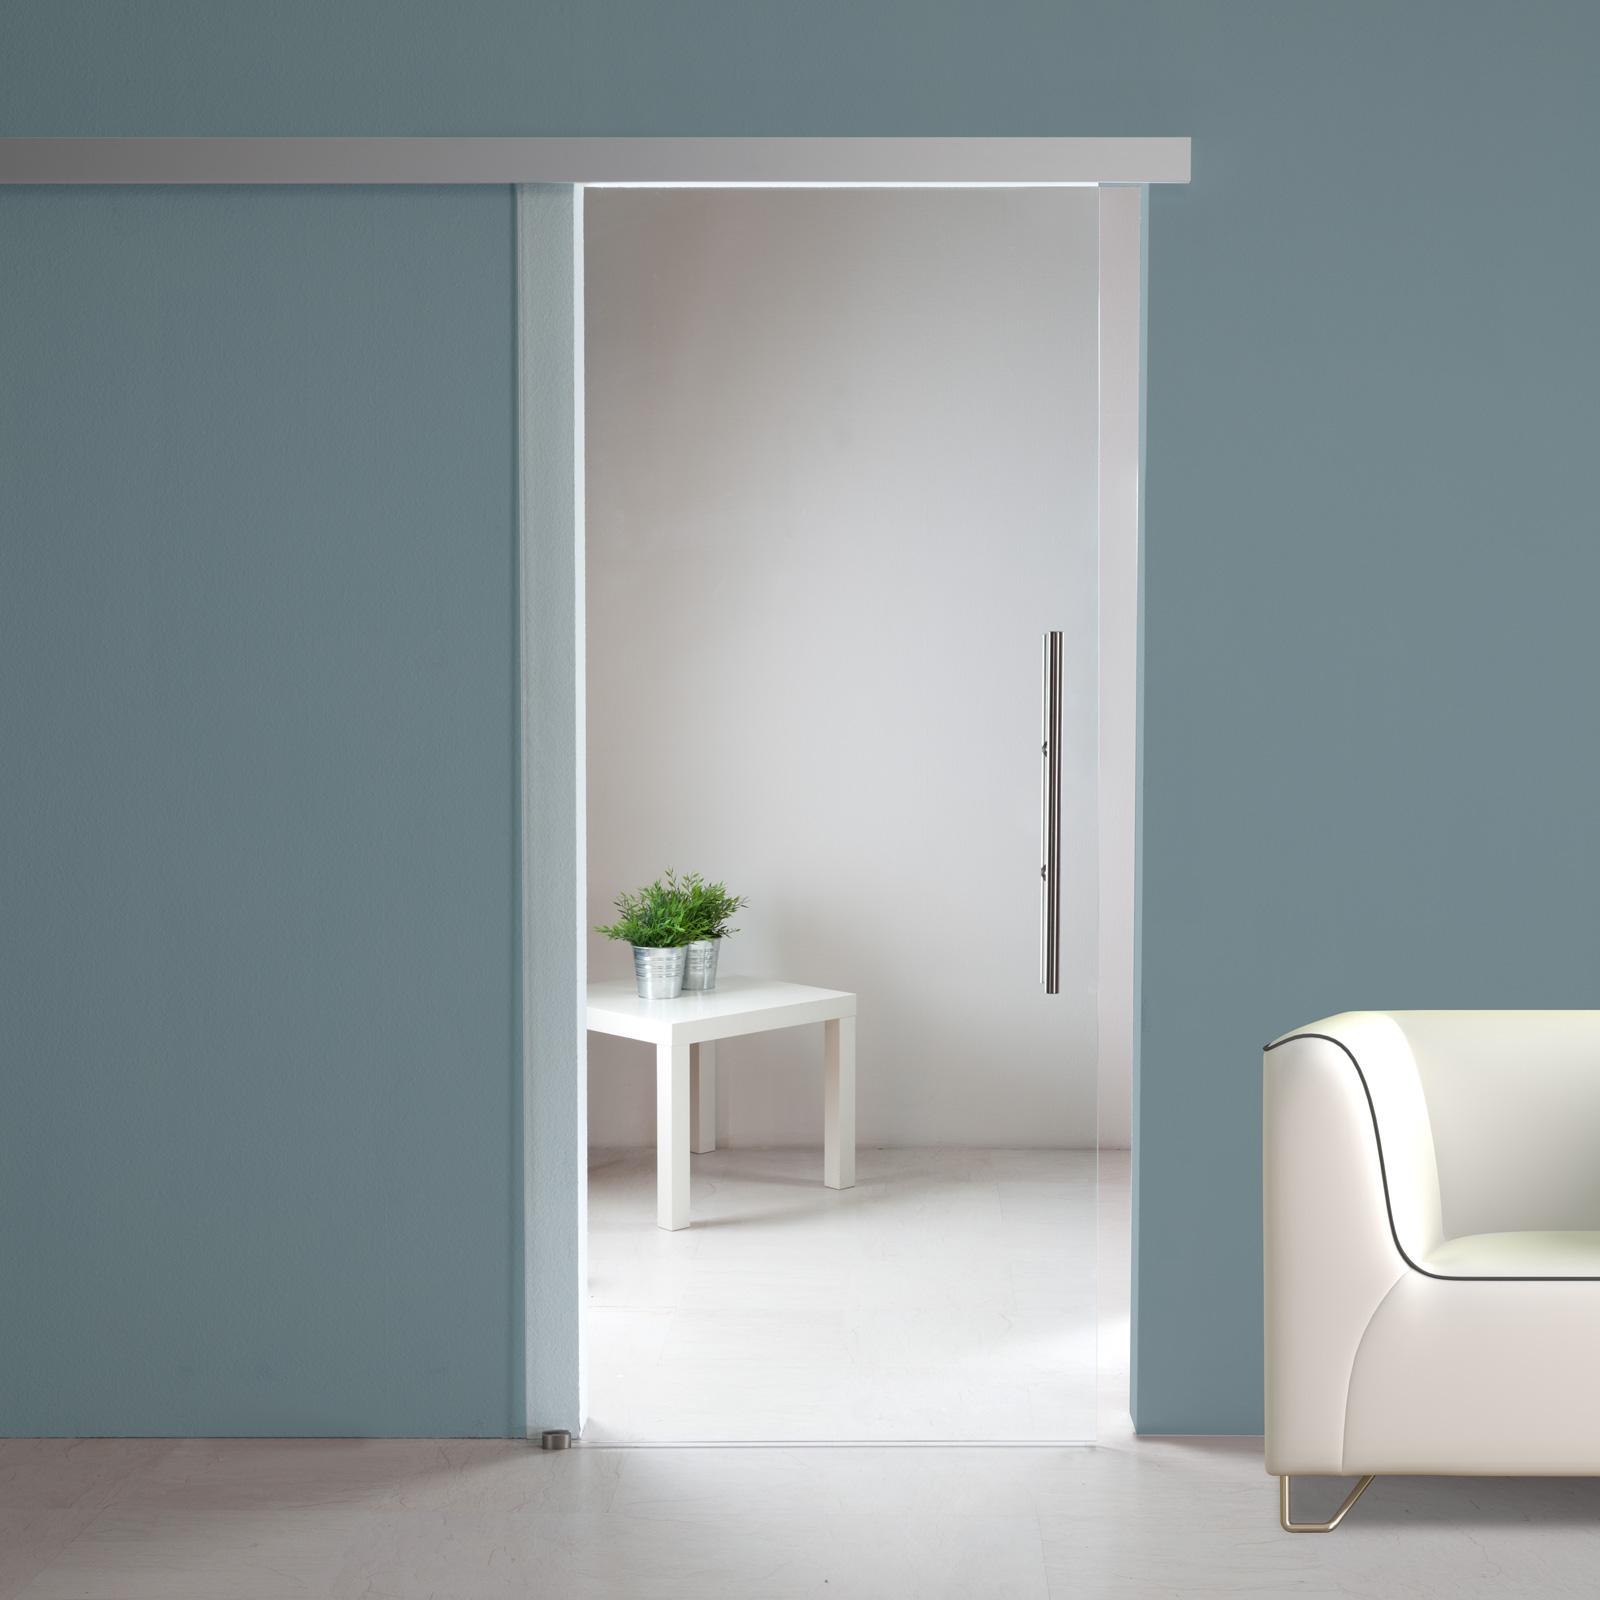 glasschiebet r st707 klarglas alu60 schiebesystem optional soft close ebay. Black Bedroom Furniture Sets. Home Design Ideas